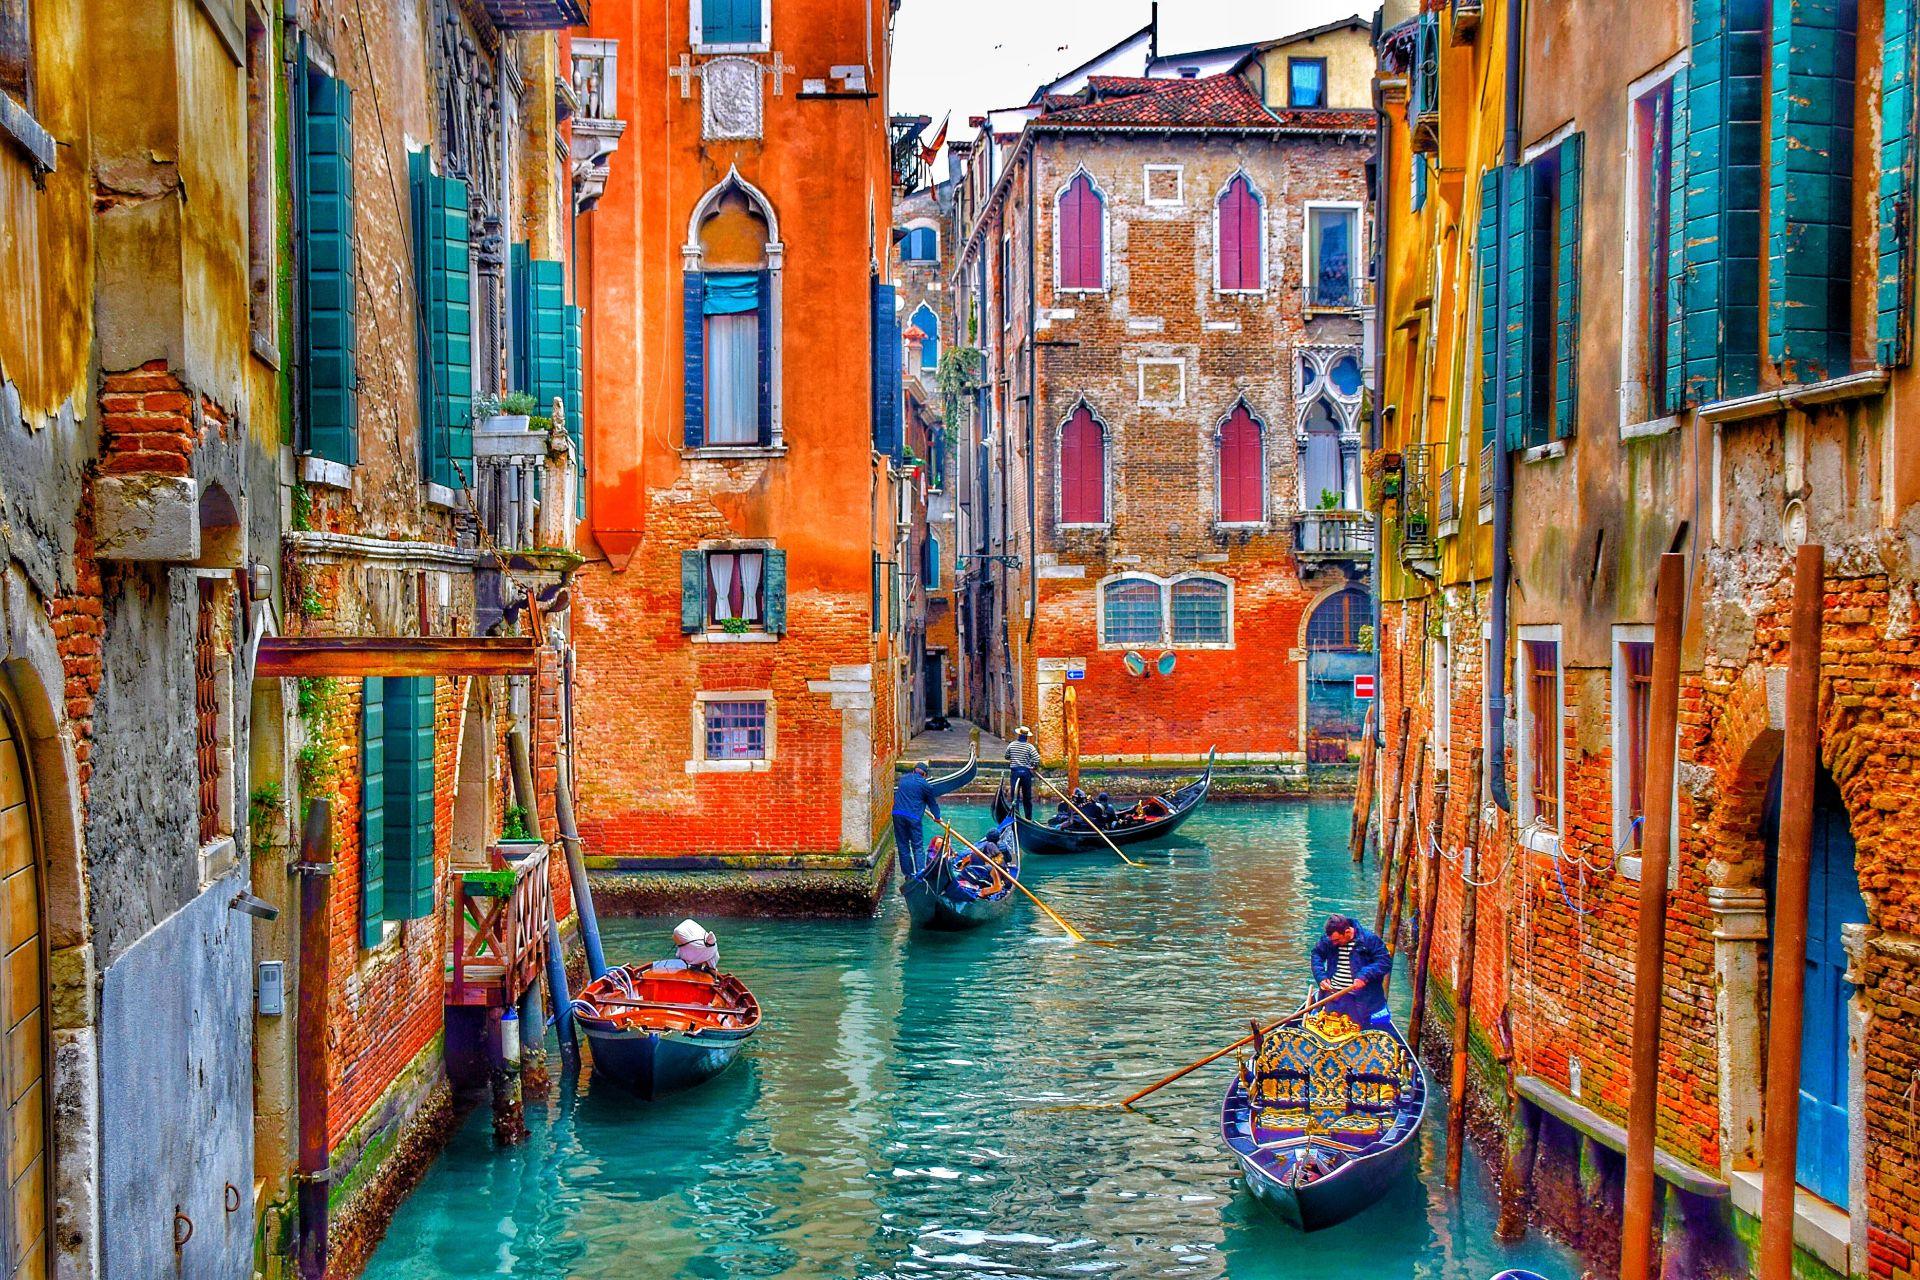 Rome, Tuscany & Venice 9 Day Tour